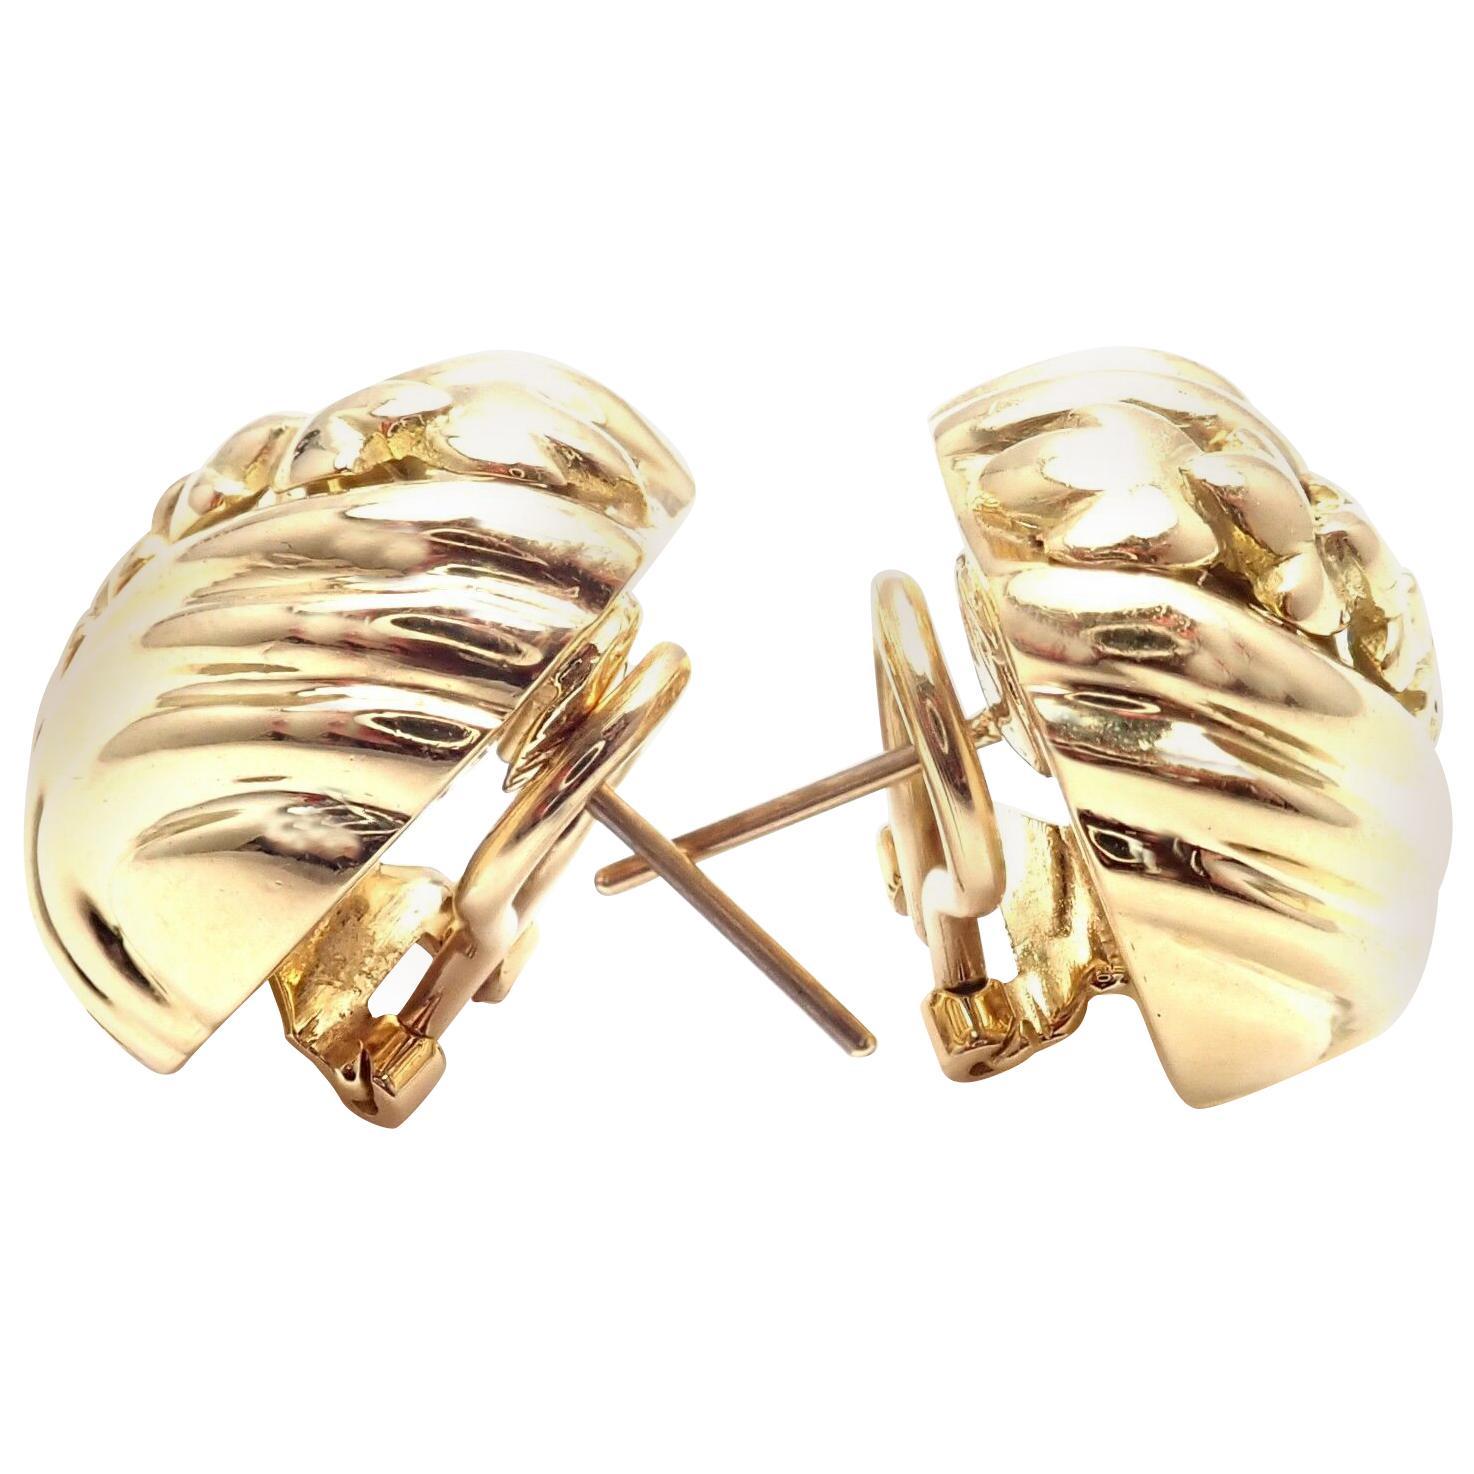 Vintage Tiffany & Co. Yellow Gold Earrings